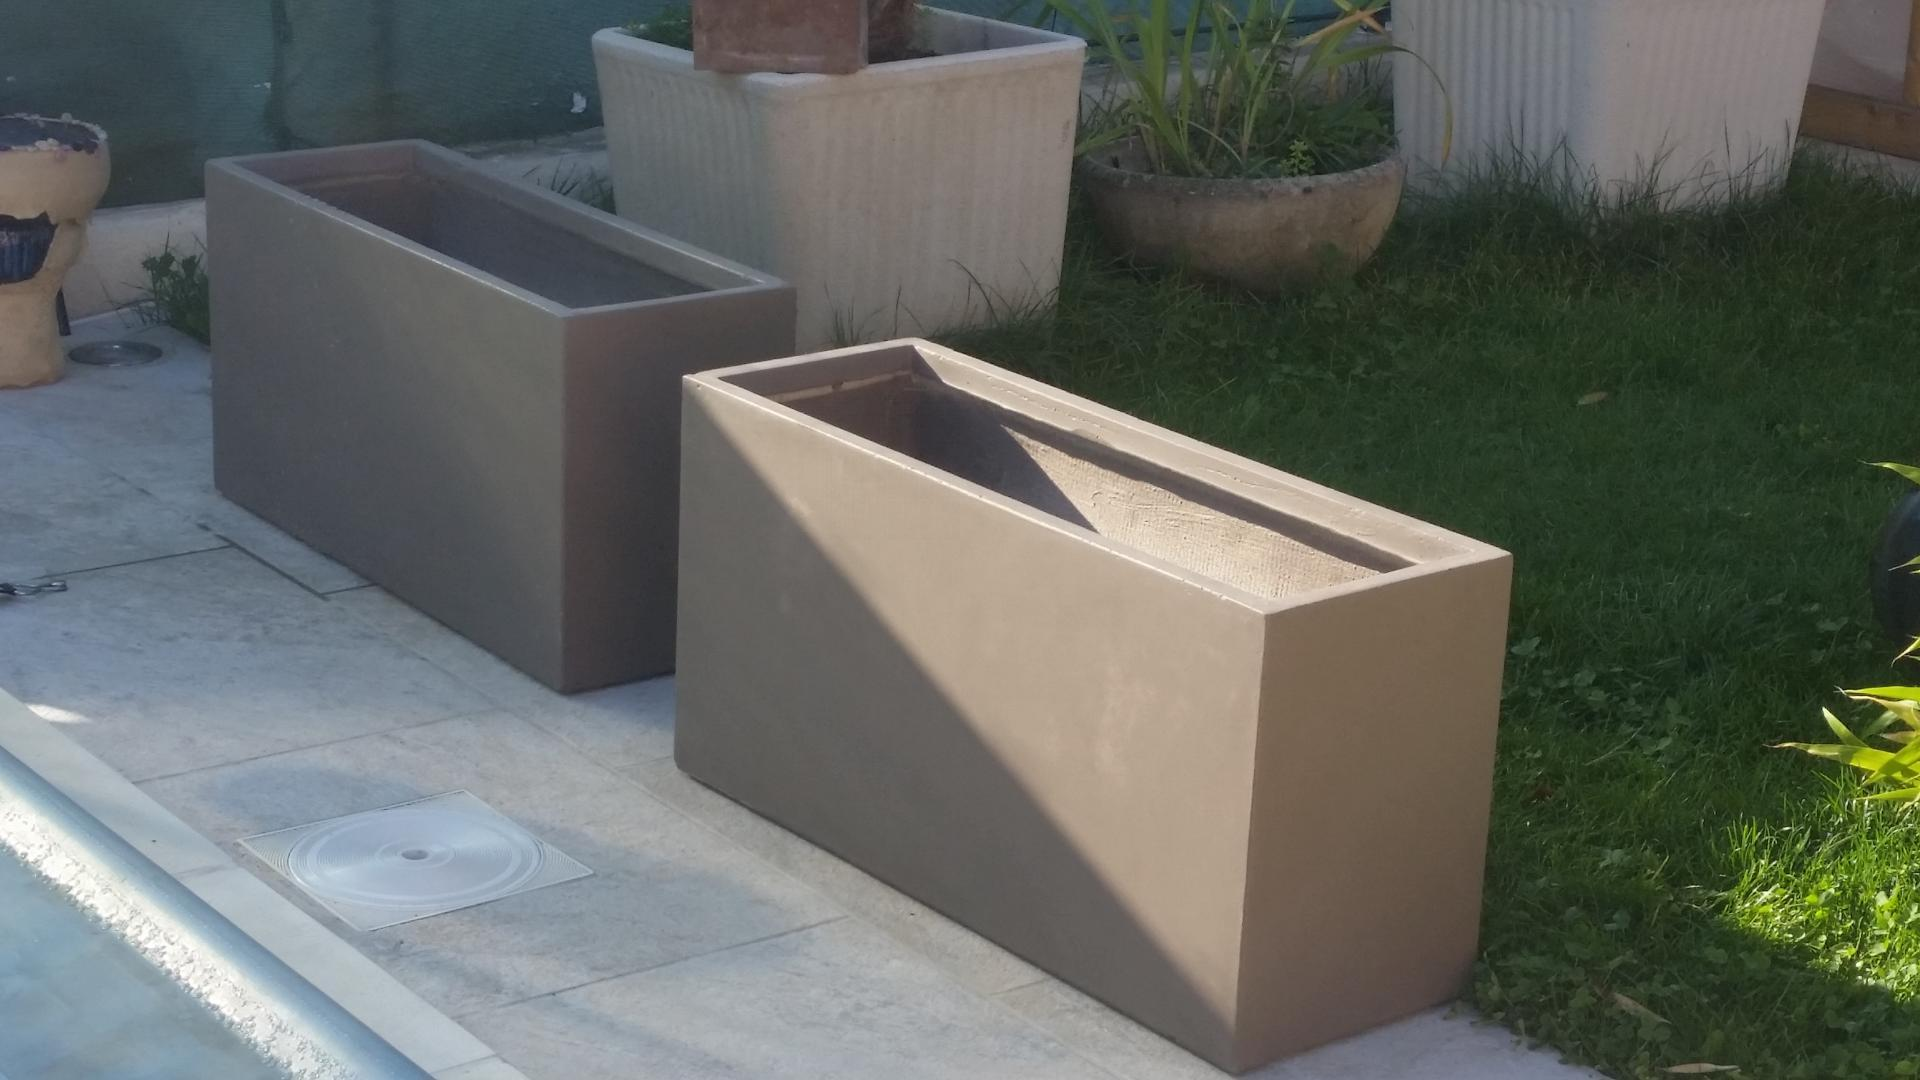 bac plantes en fibre de terre taupe. Black Bedroom Furniture Sets. Home Design Ideas